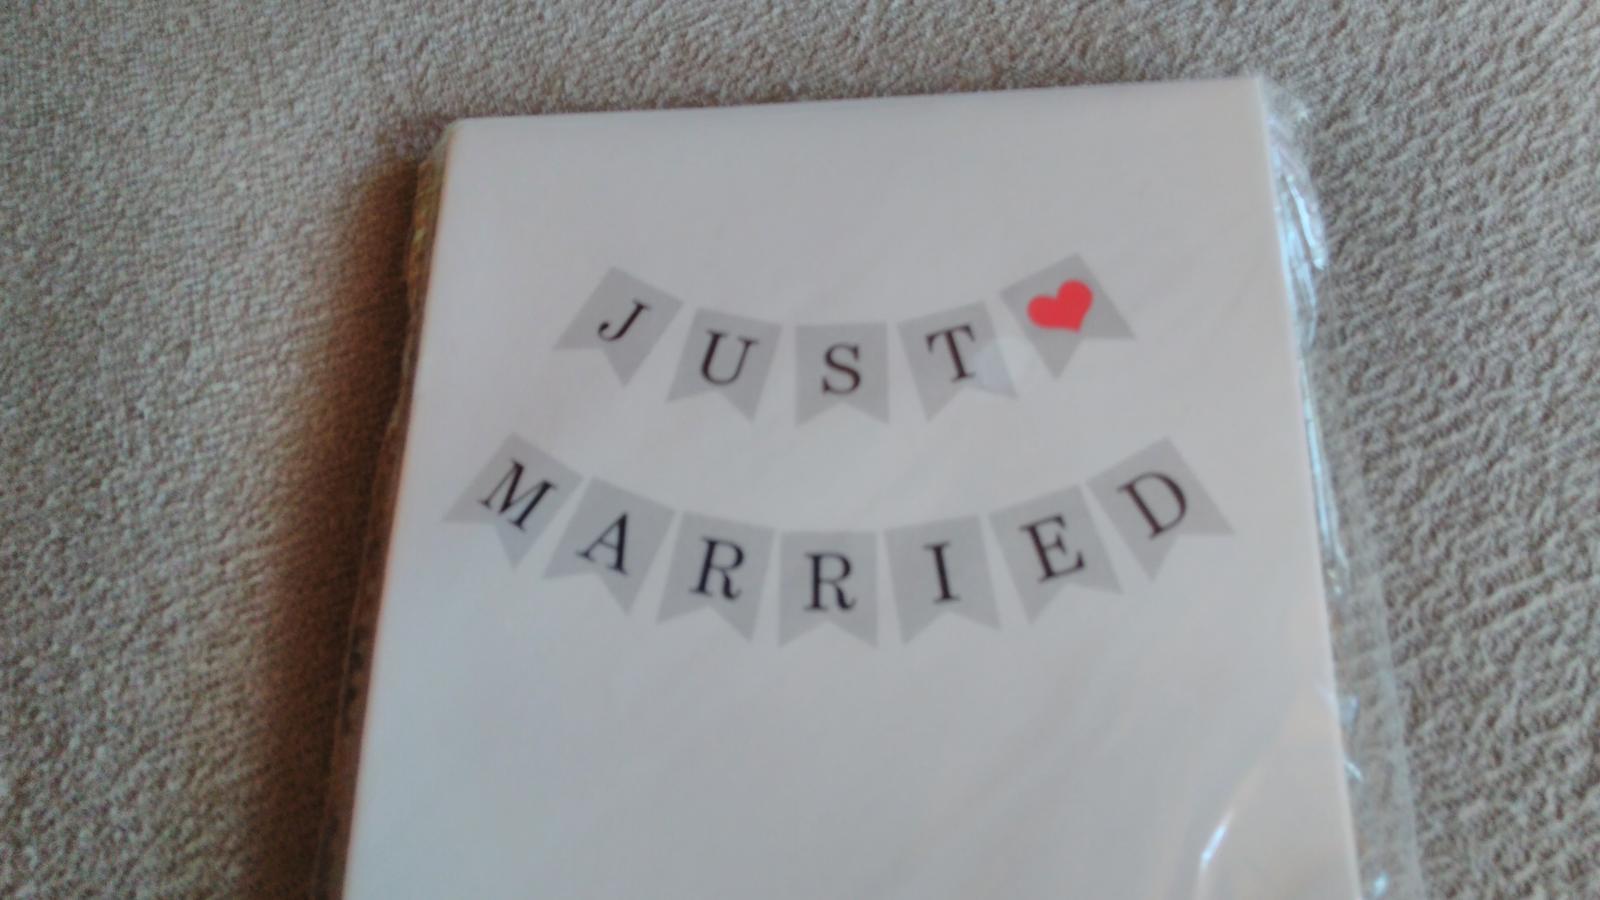 Just married 2ks. - Obrázek č. 1